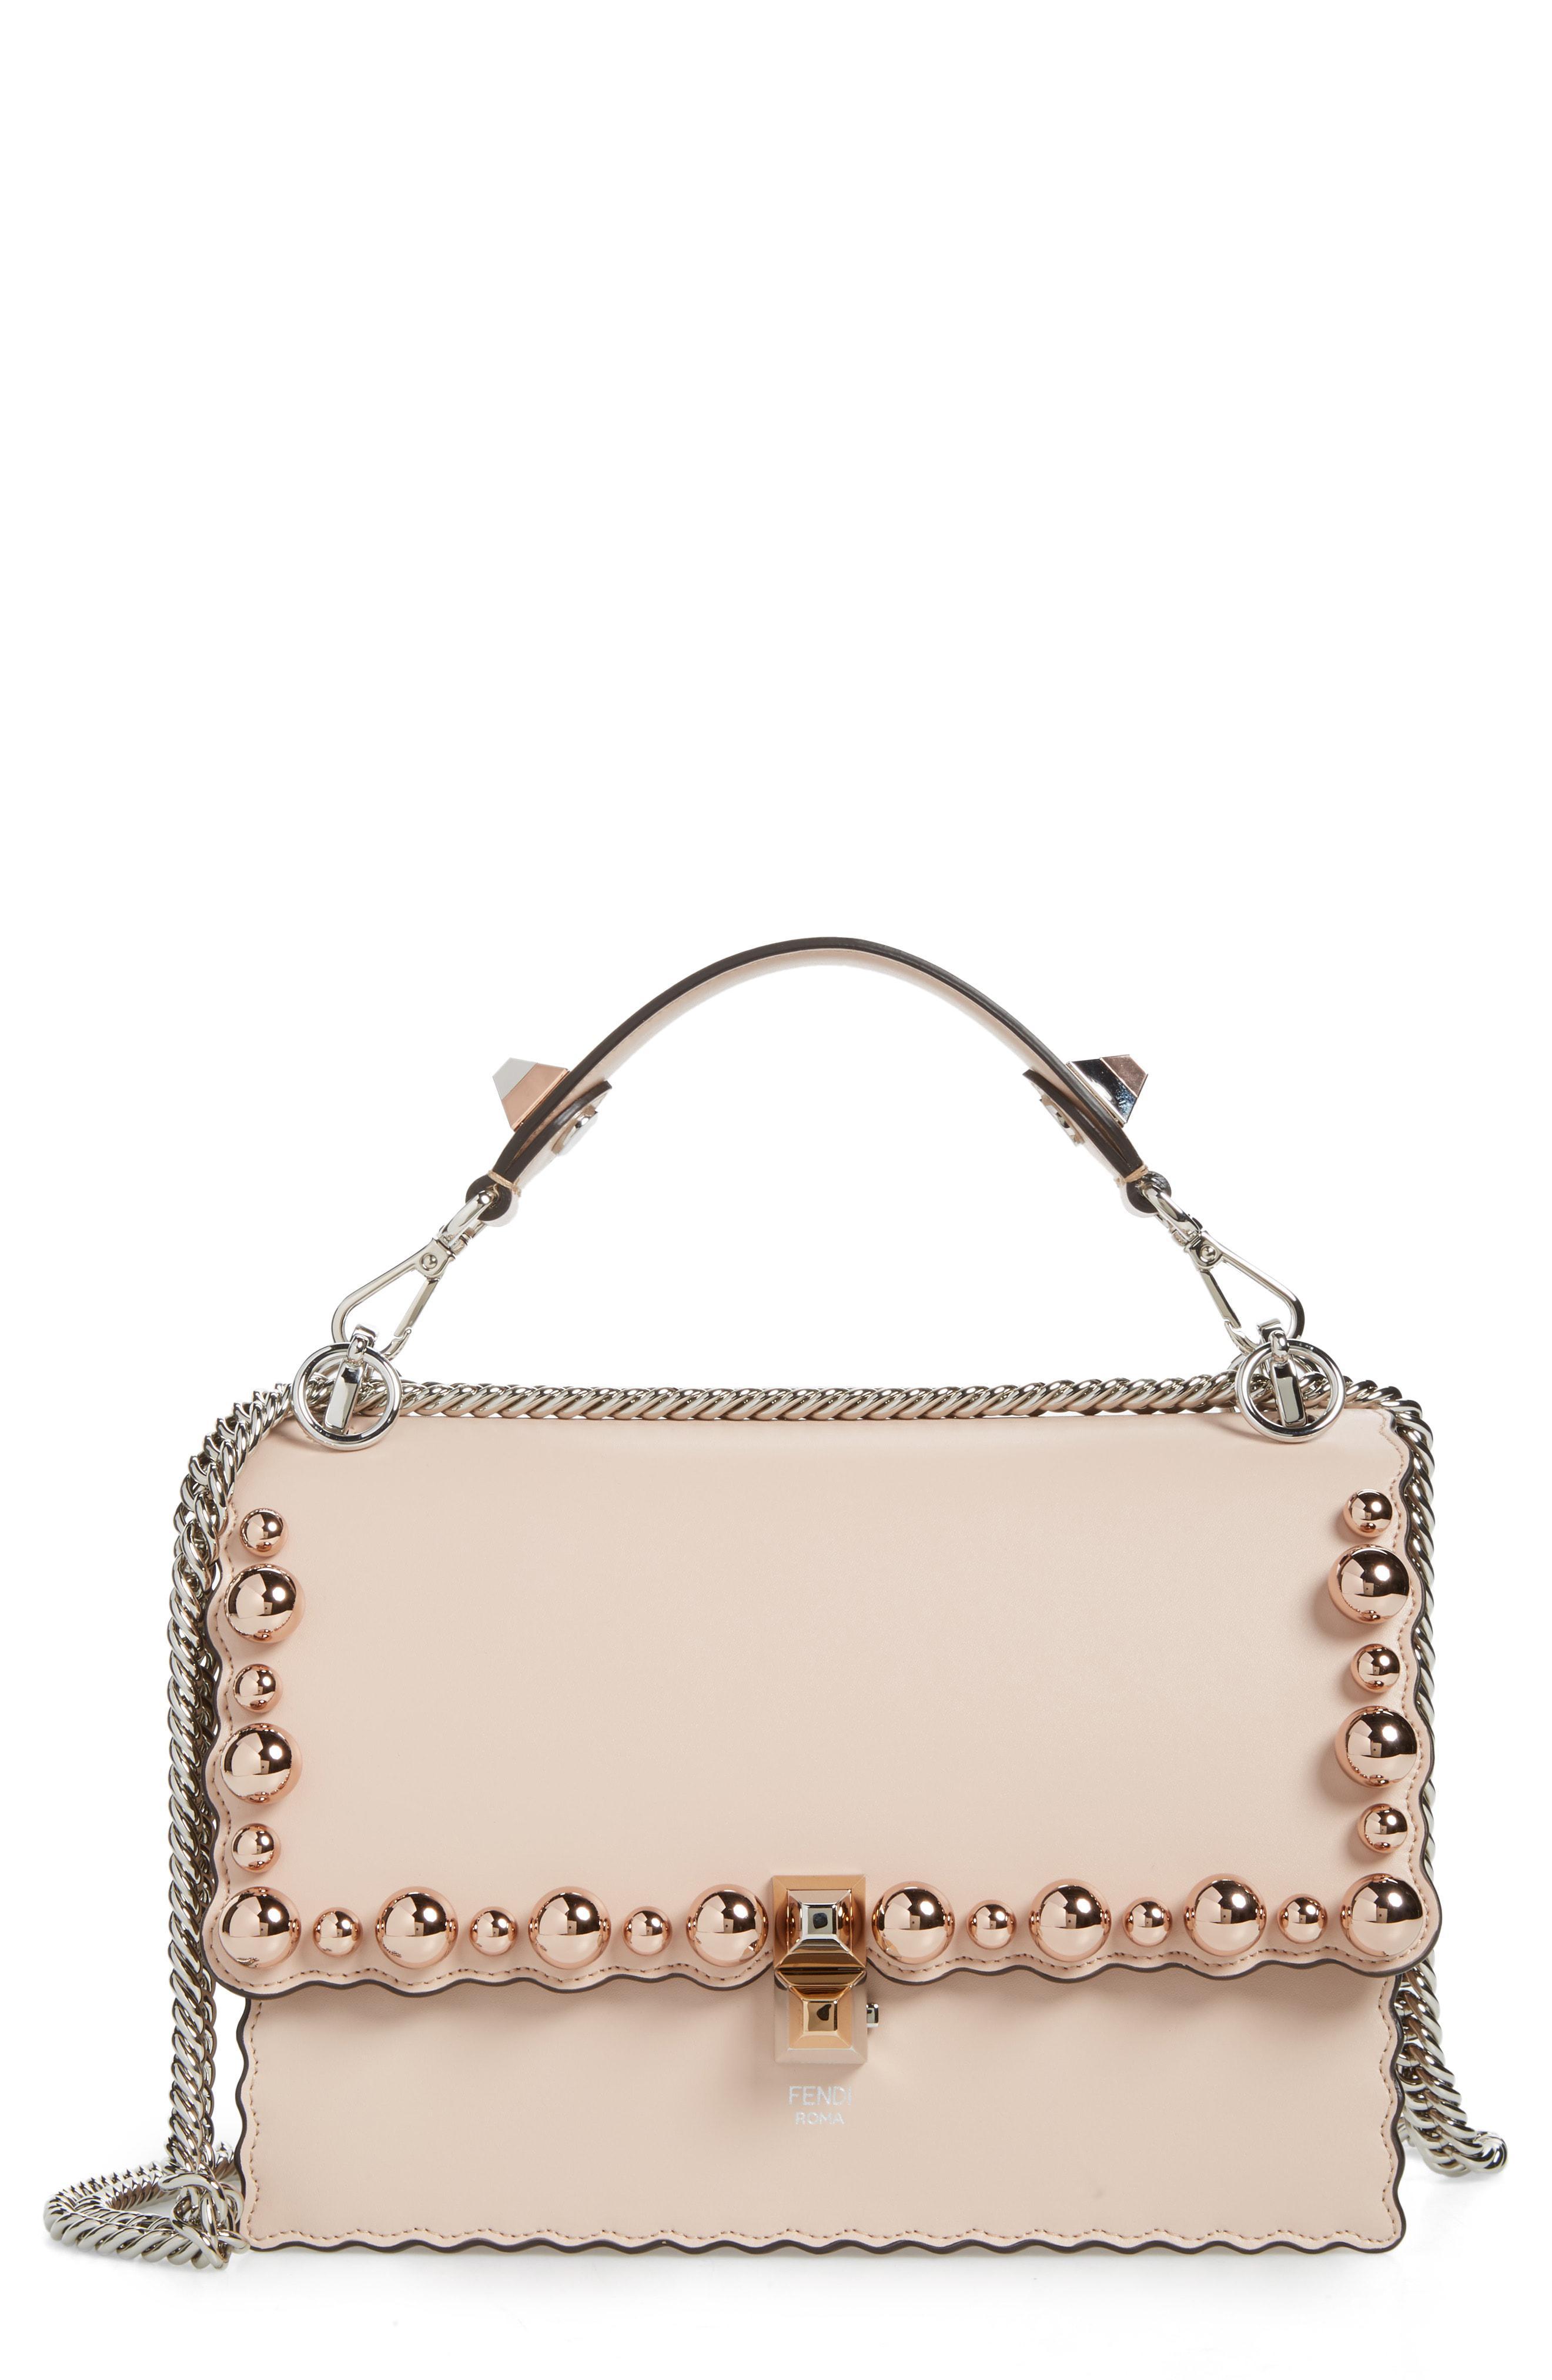 bcc5c12a304d5 Fendi. Women s Mini Kan I Imitation Pearl Scallop Leather Shoulder Bag